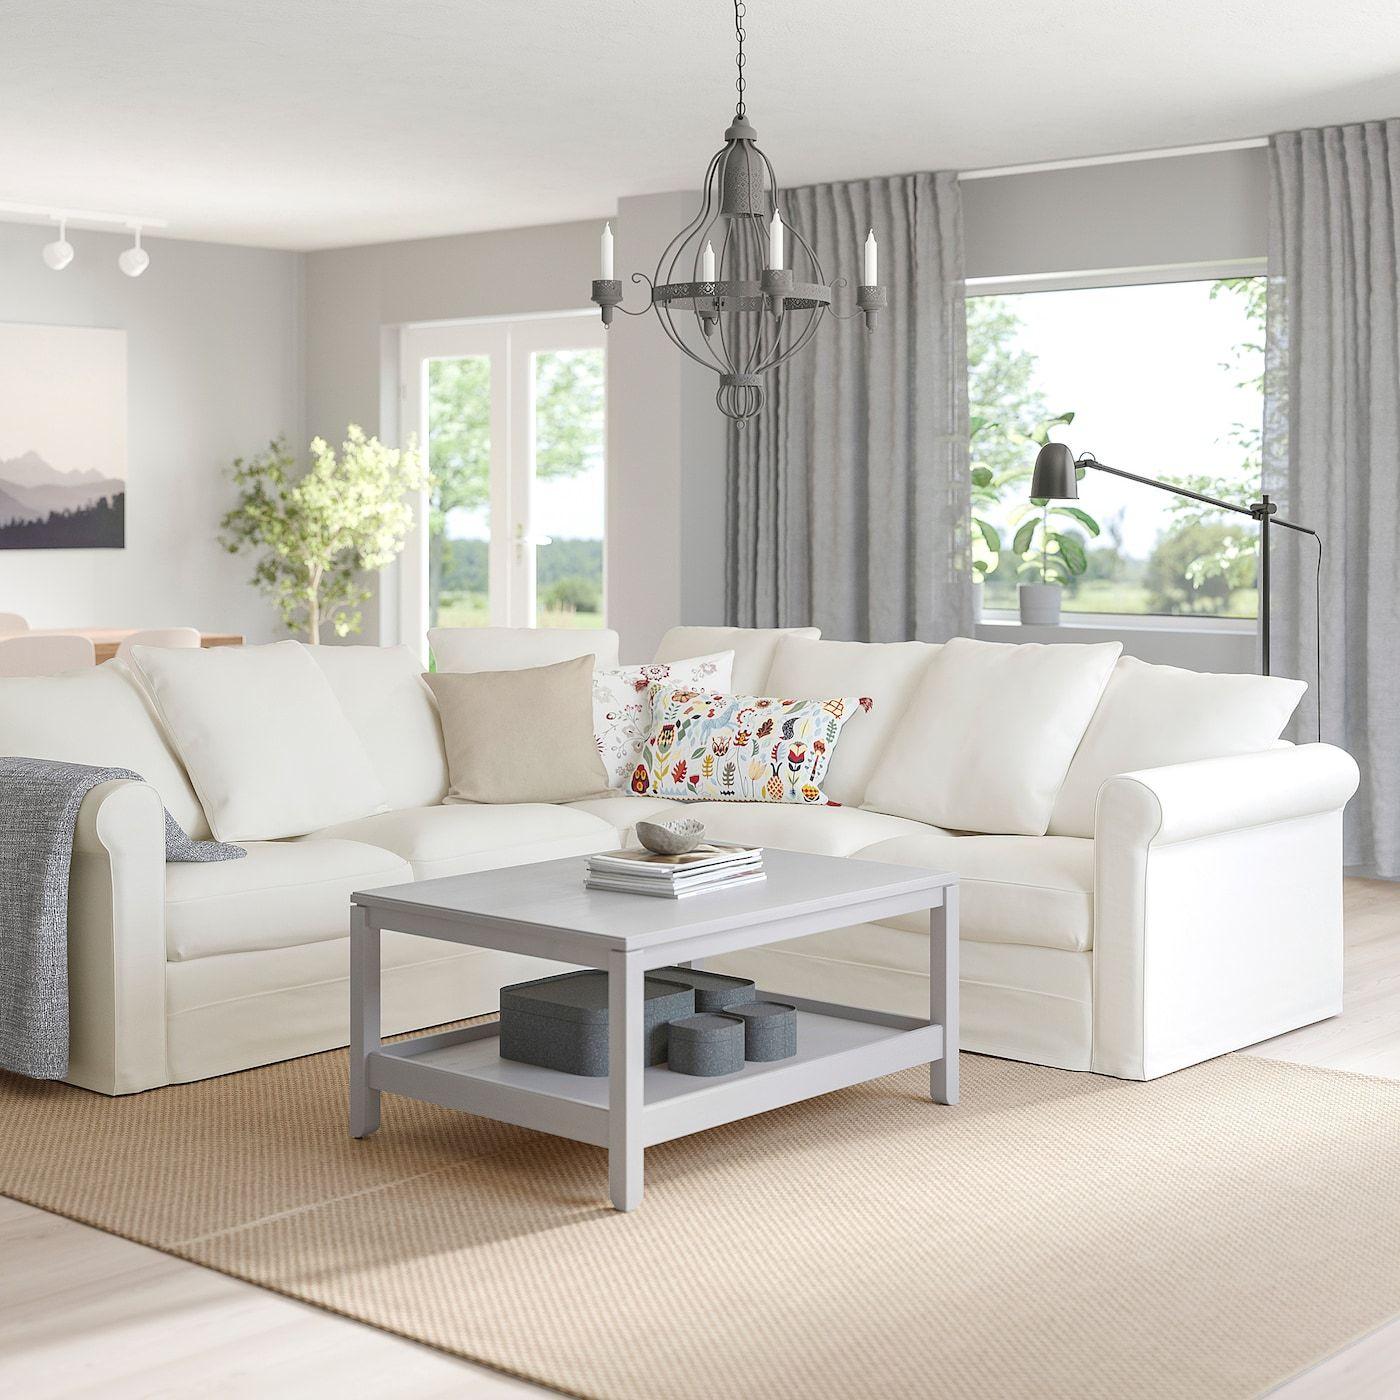 GRÖNLID Inseros white, 3 seat sofa IKEA